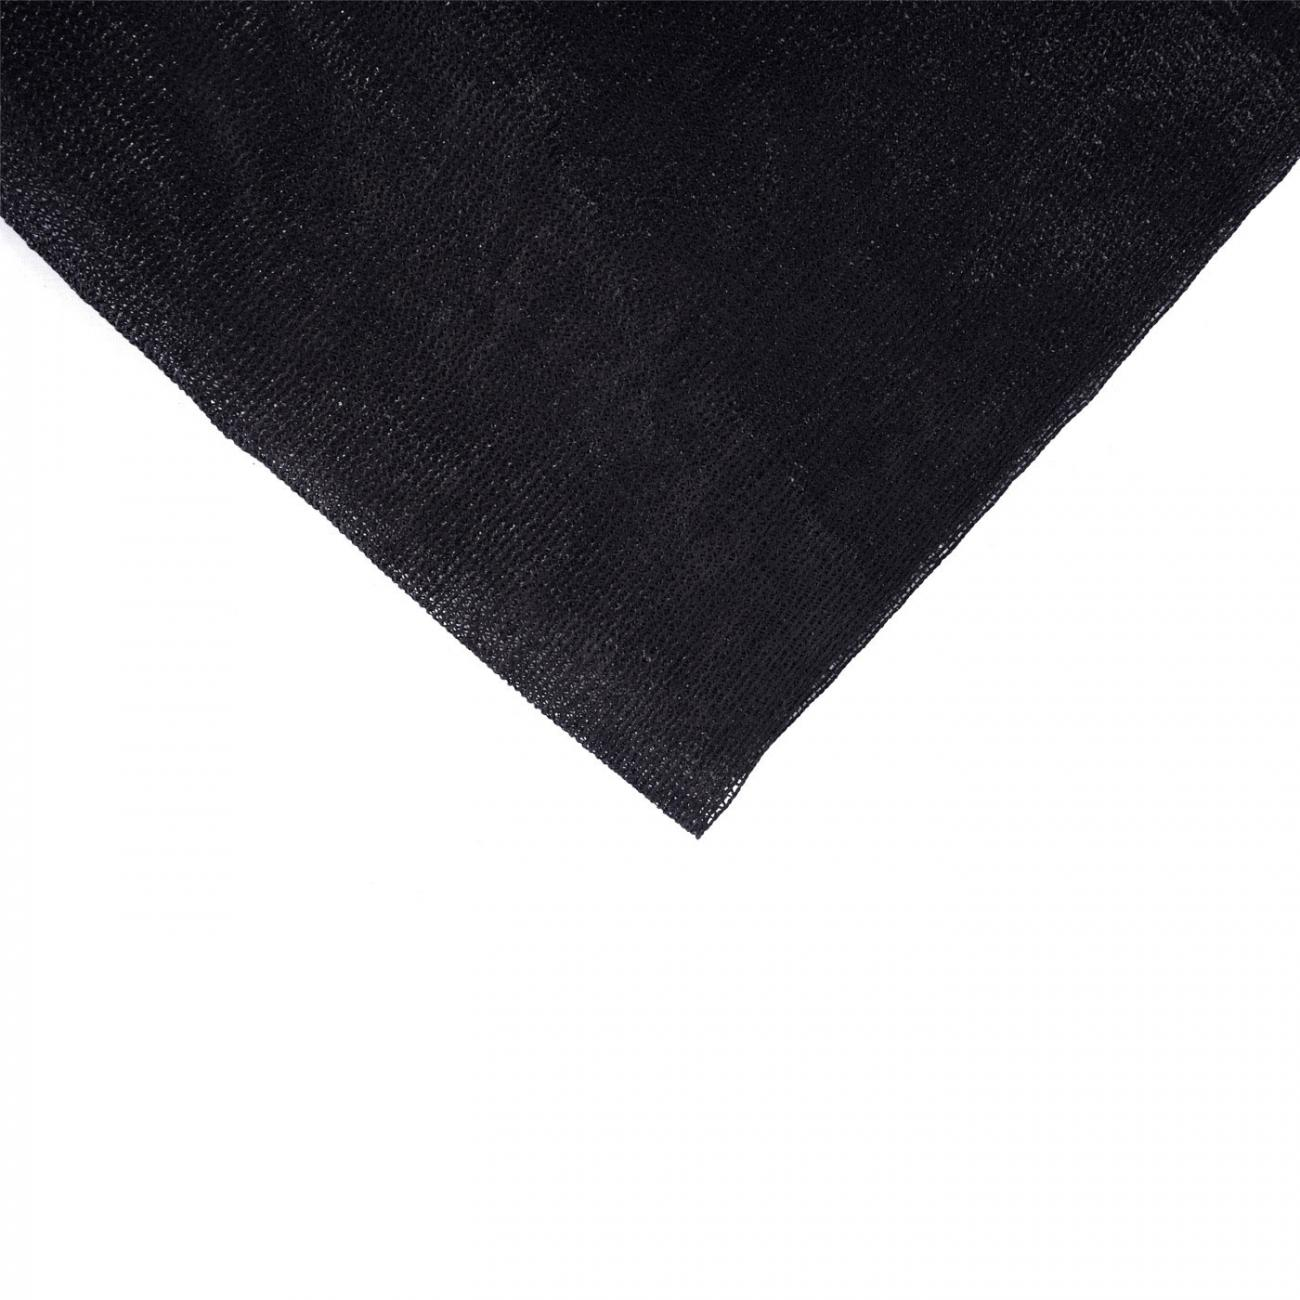 MALLA RASCHEL NEGRA 4,20 ANCHO 80% X MT LINEAL